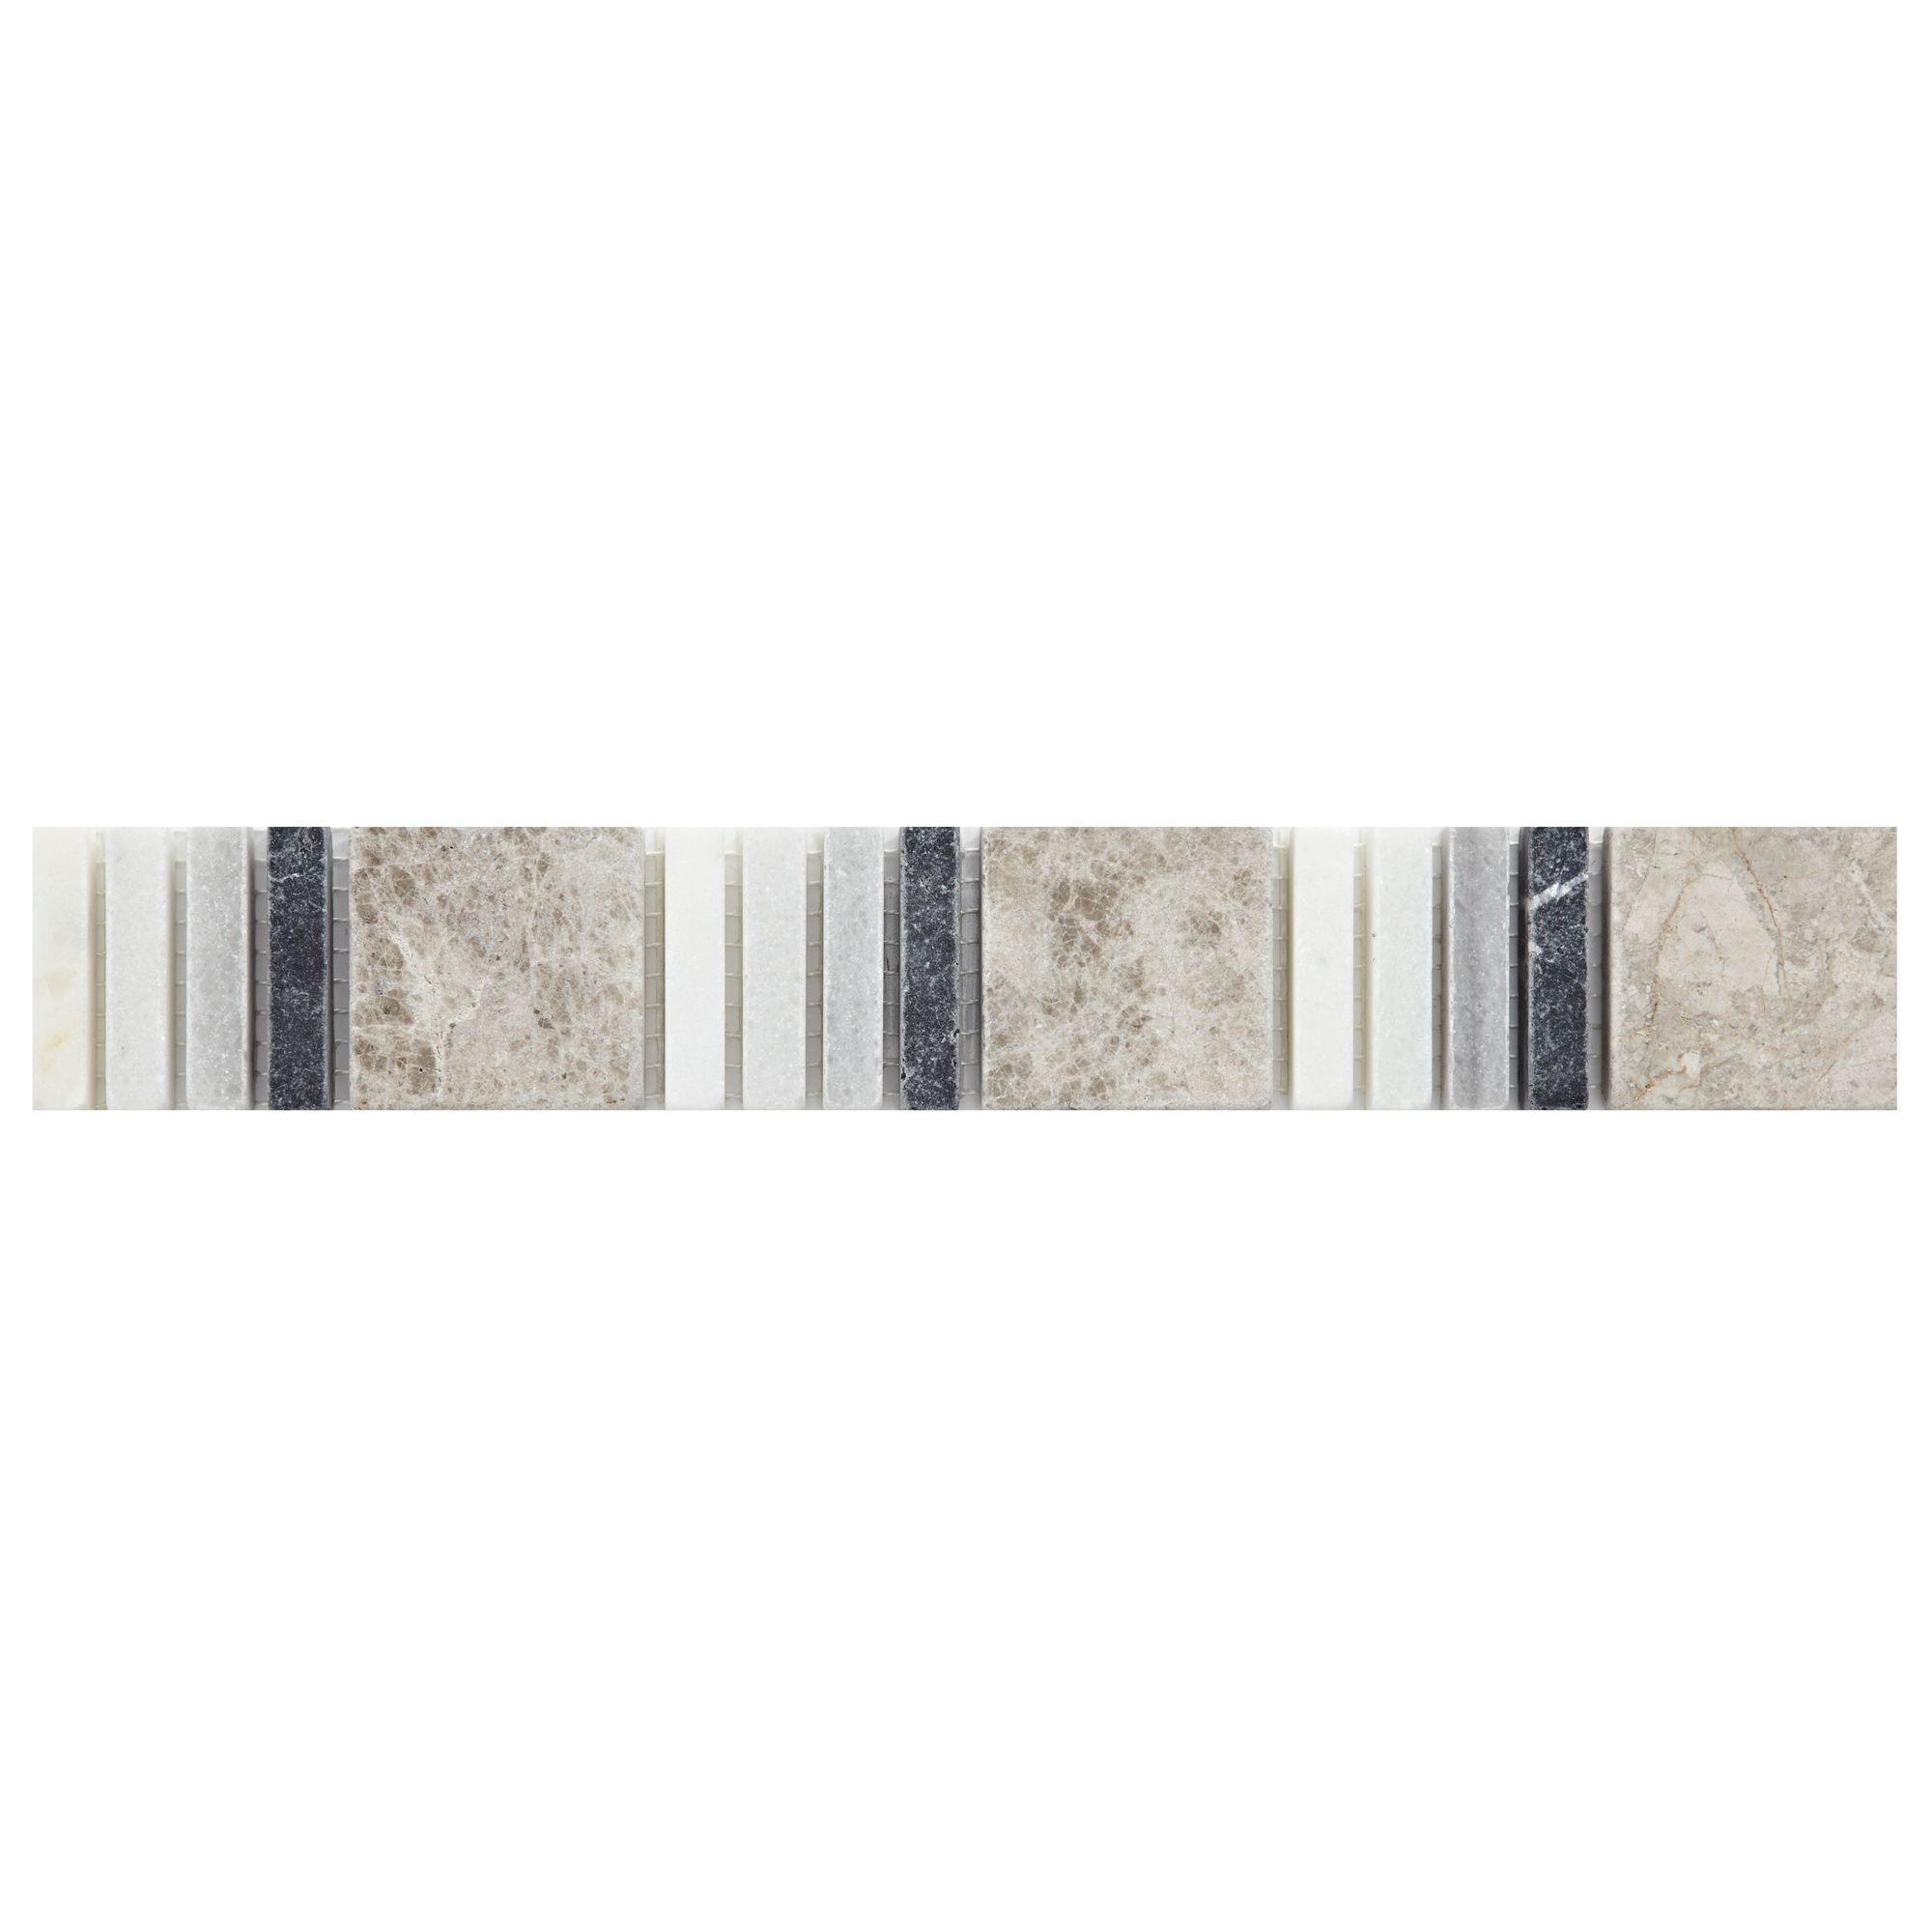 Black White Amp Grey Mosaic Marble Border Tile L 305mm W